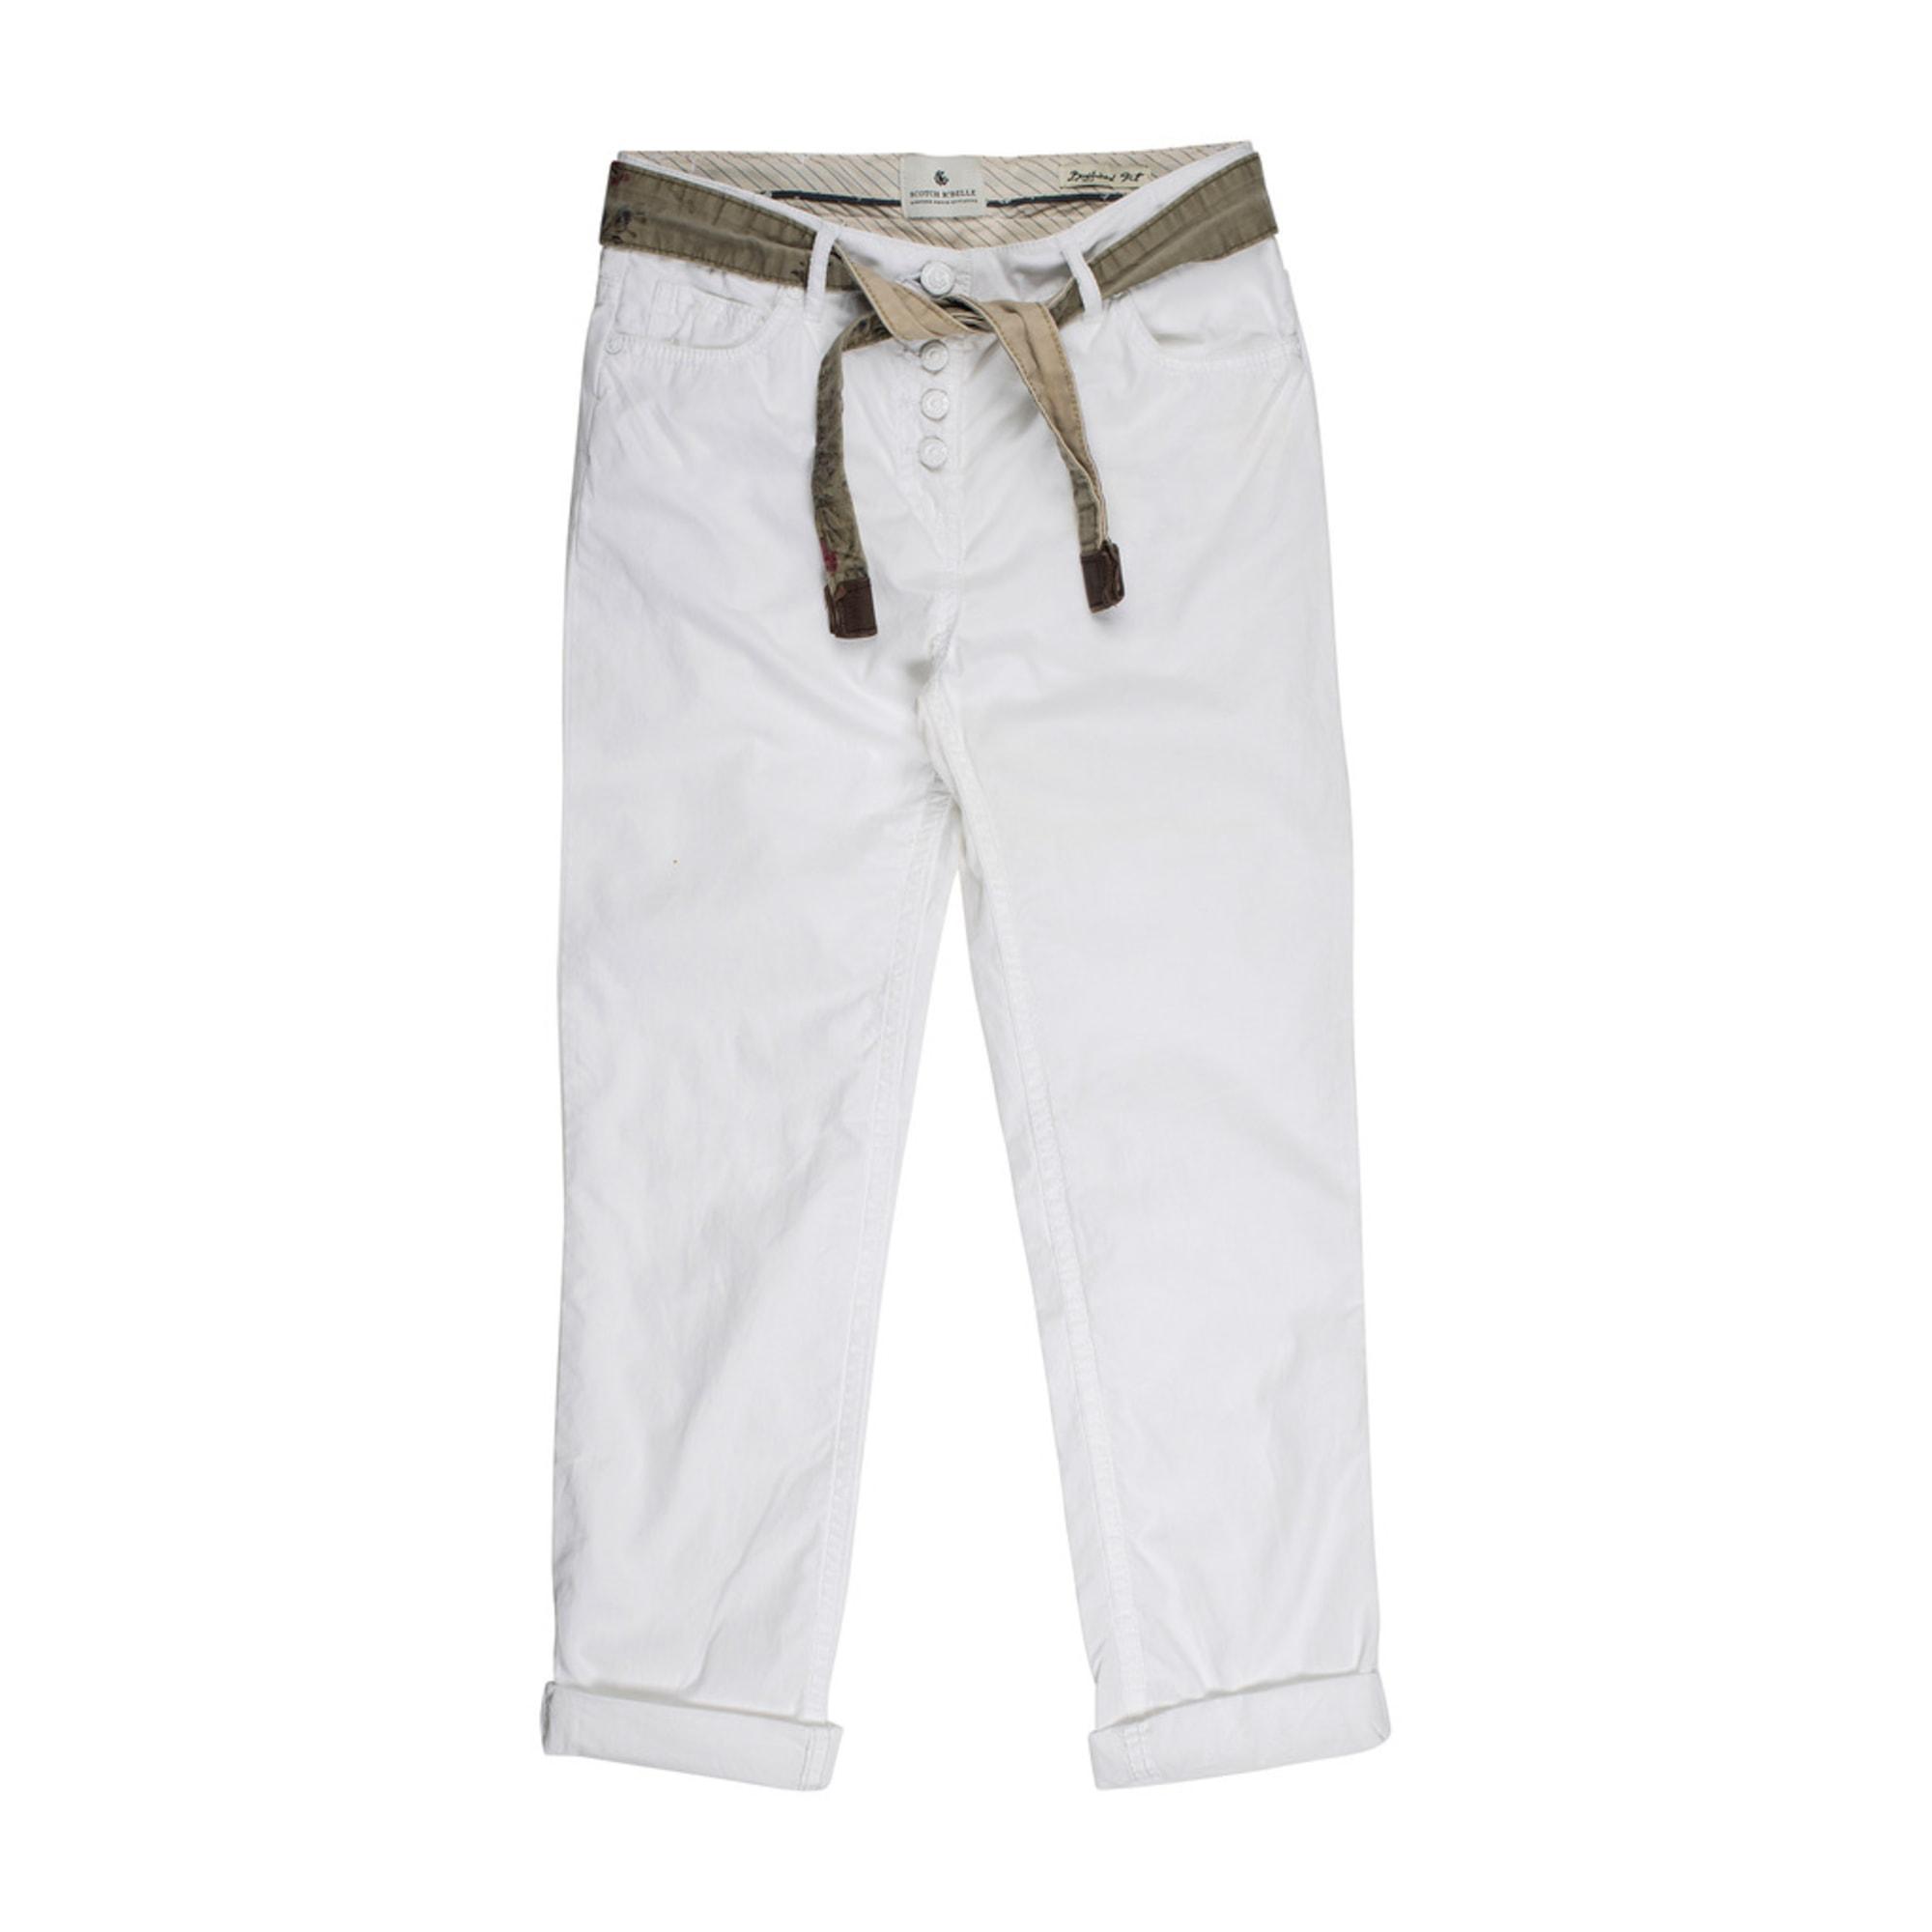 Pantalon SCOTCH & SODA Blanc, blanc cassé, écru